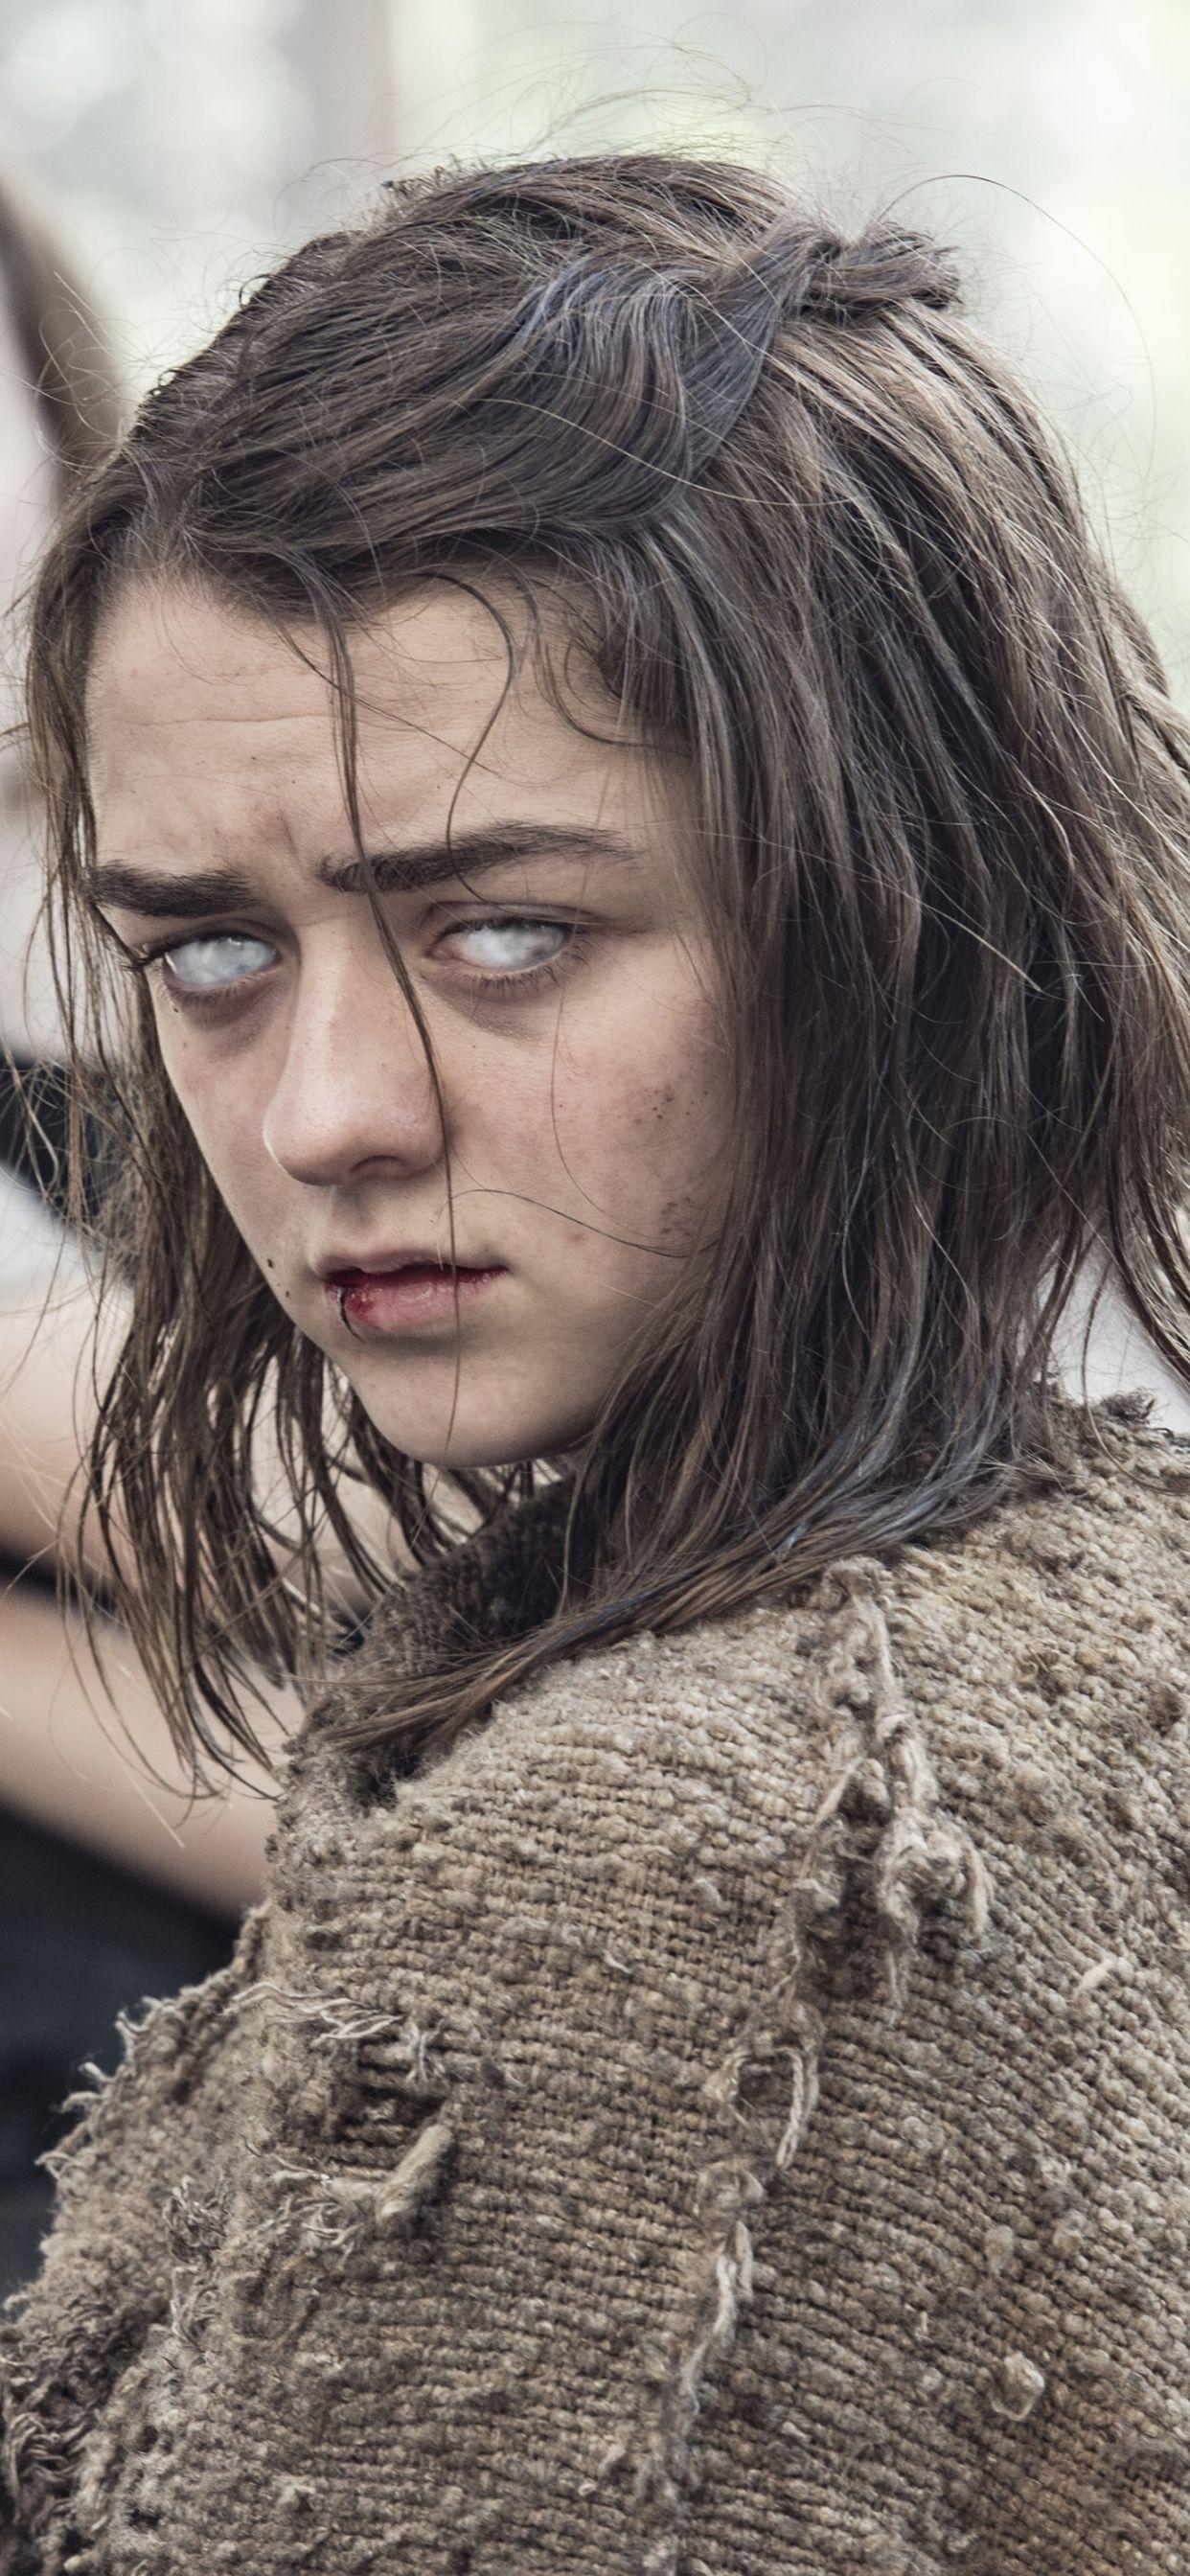 Tv Show Game Of Thrones Arya Stark Maisie Williams Maisie